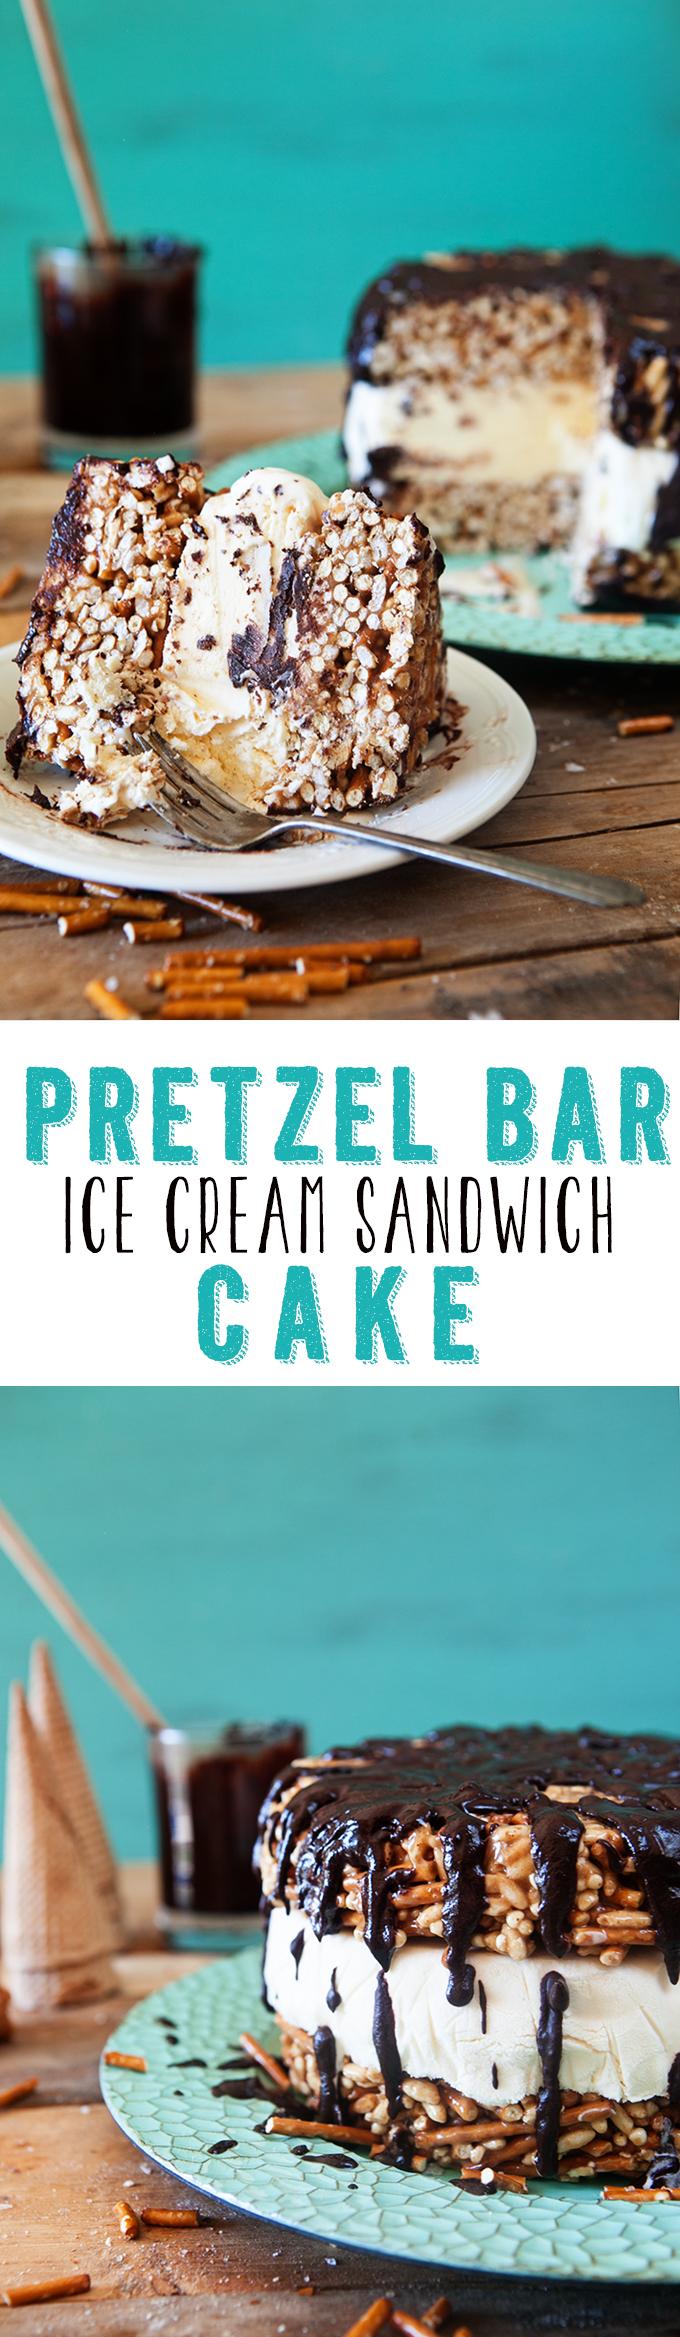 Pretzel Bar Ice Cream Sandwich Cake: An Easy No Bake Ice Cream Dessert Recipe